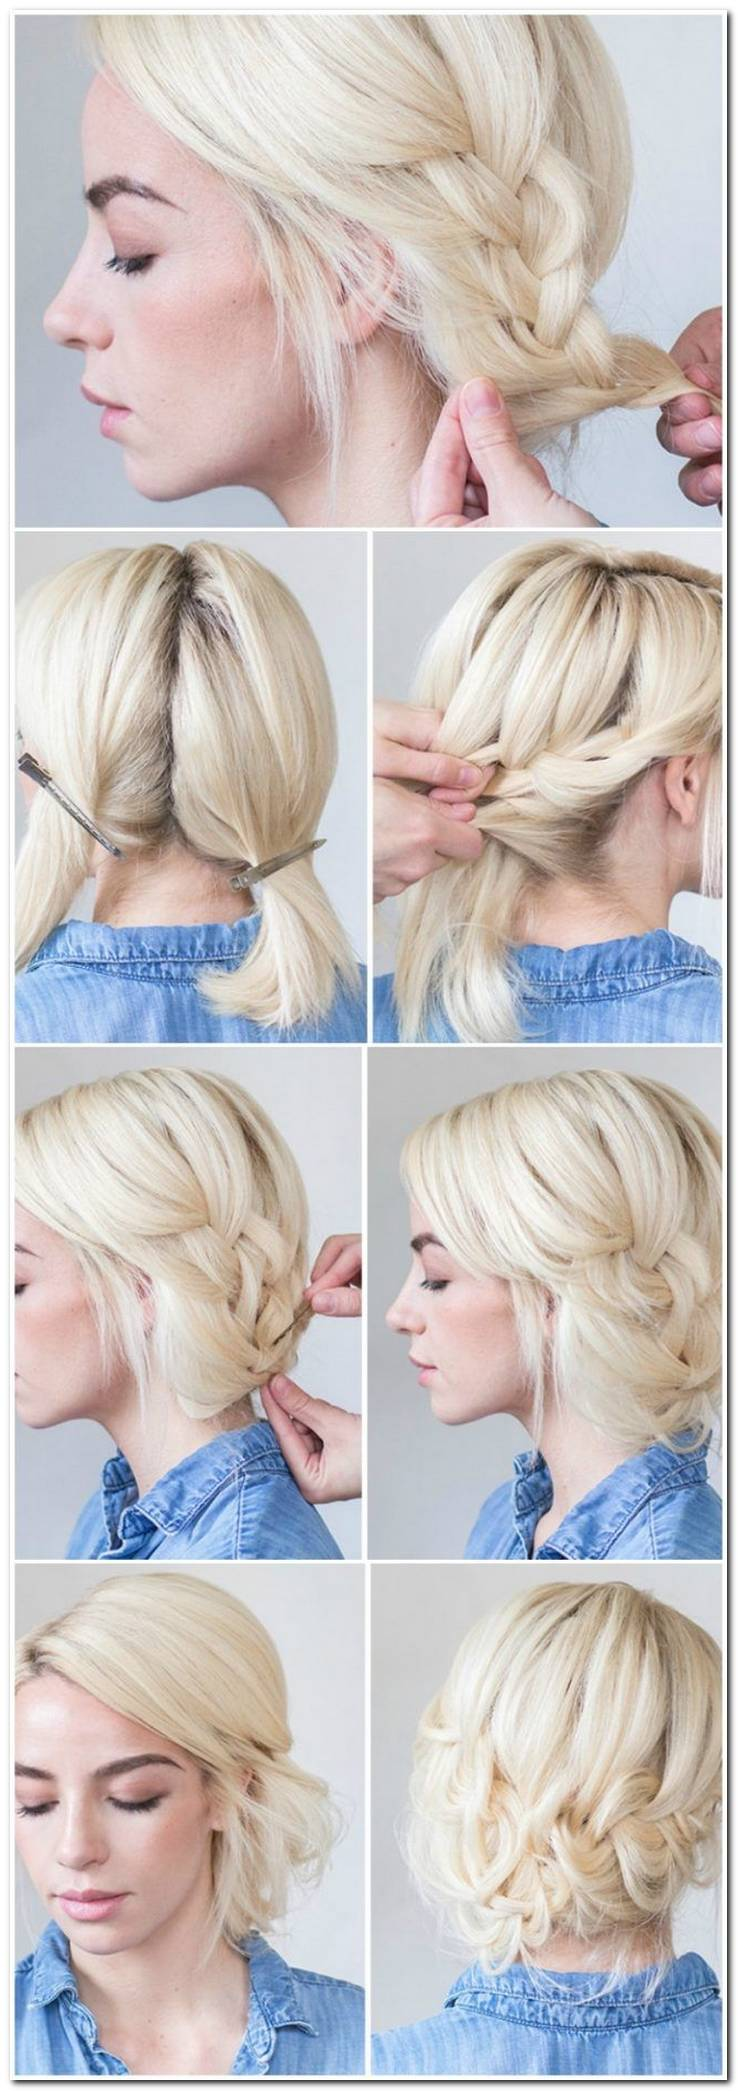 Frisuren Selber Machen Anleitung Kurze Haare